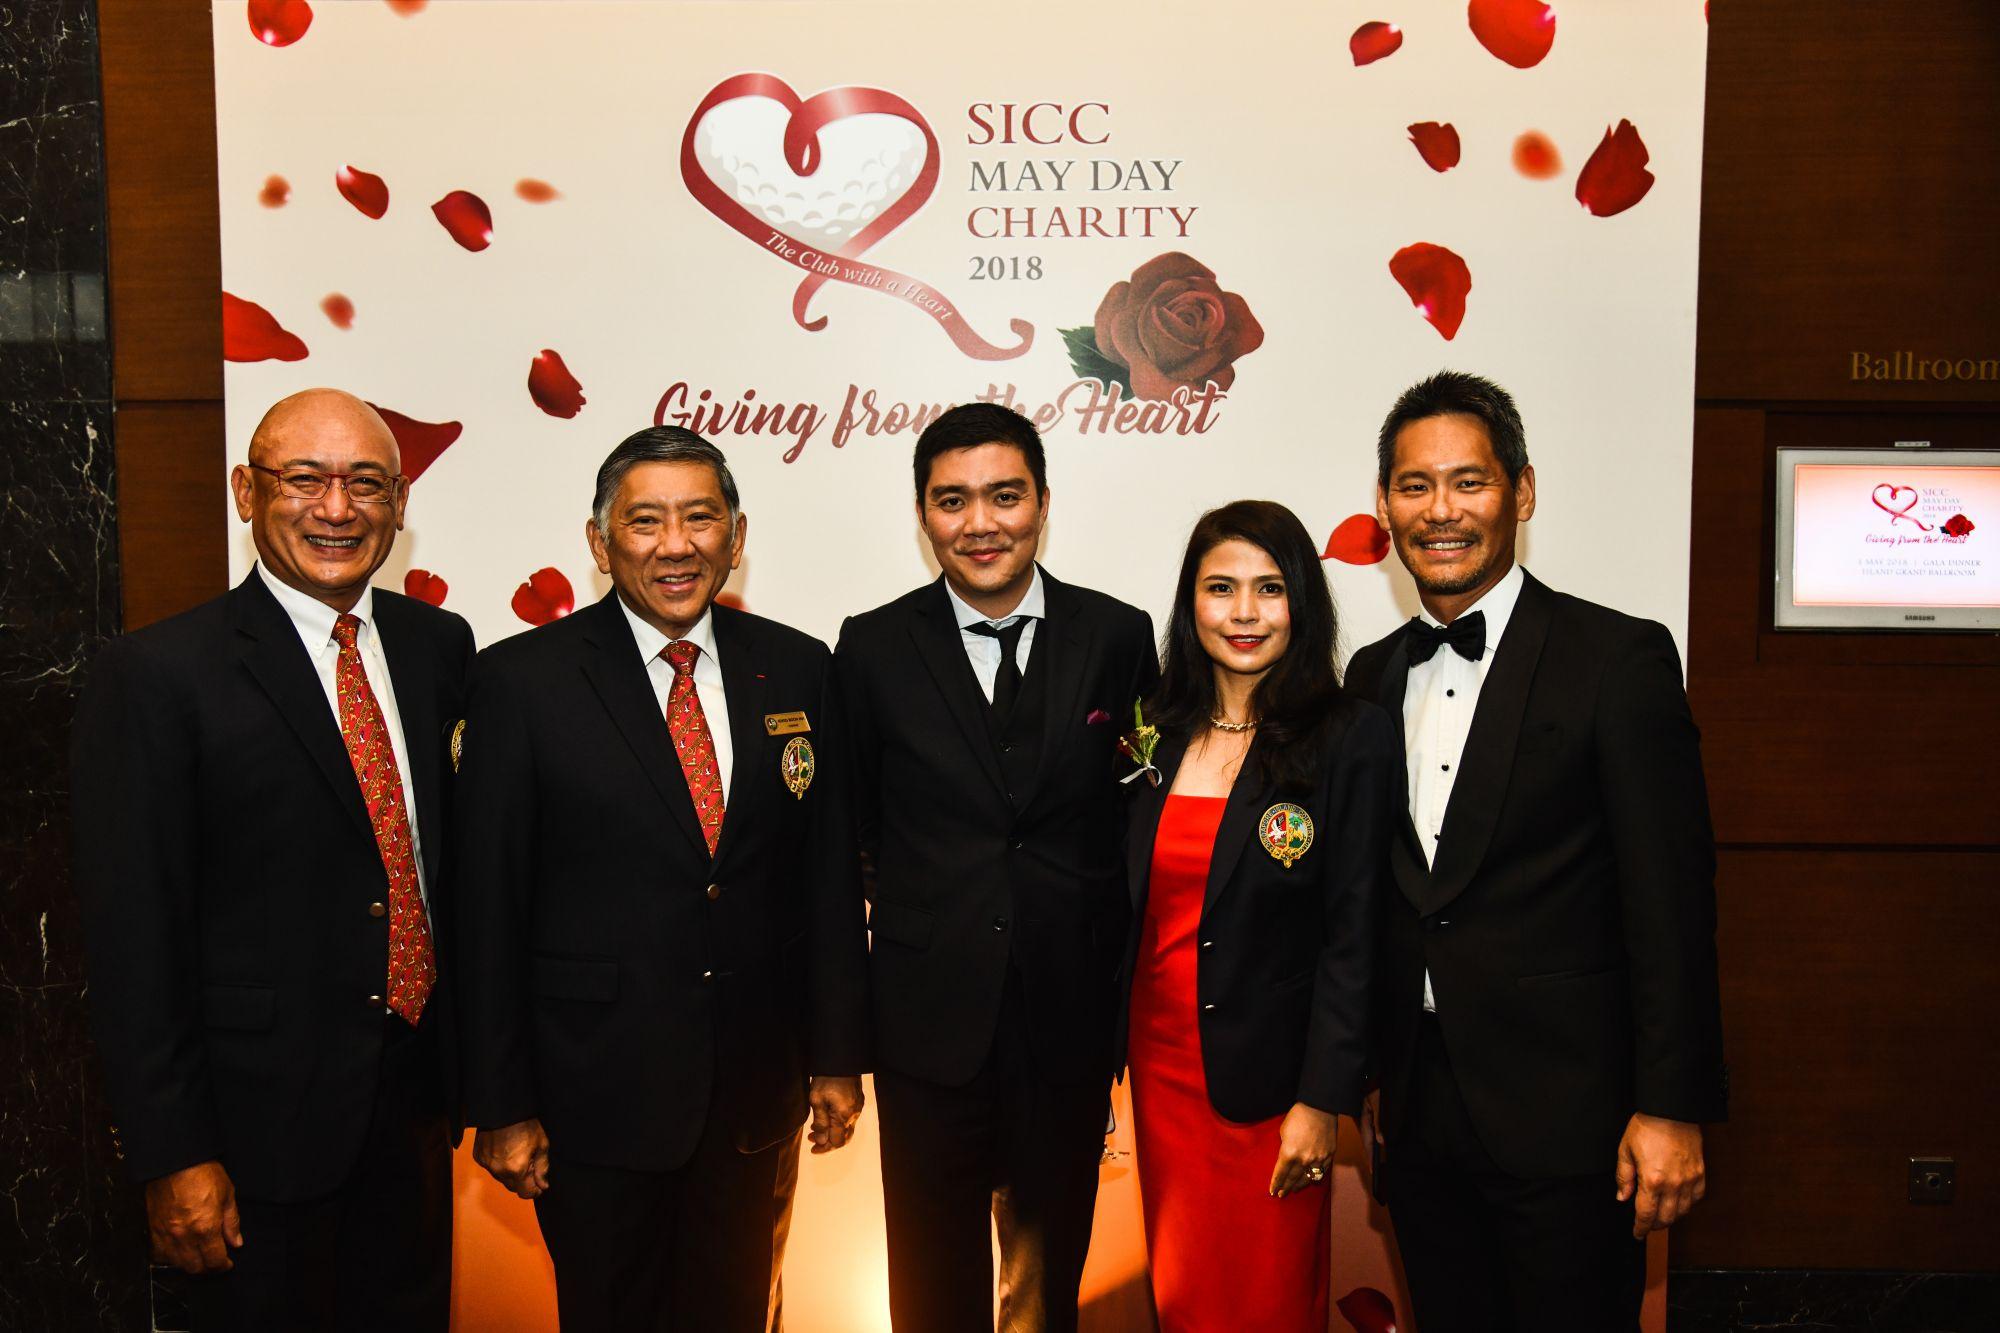 Andrew Low, Khoo Boon Hui, Shaun Tay, Marilyn Lum, Ivan Chua